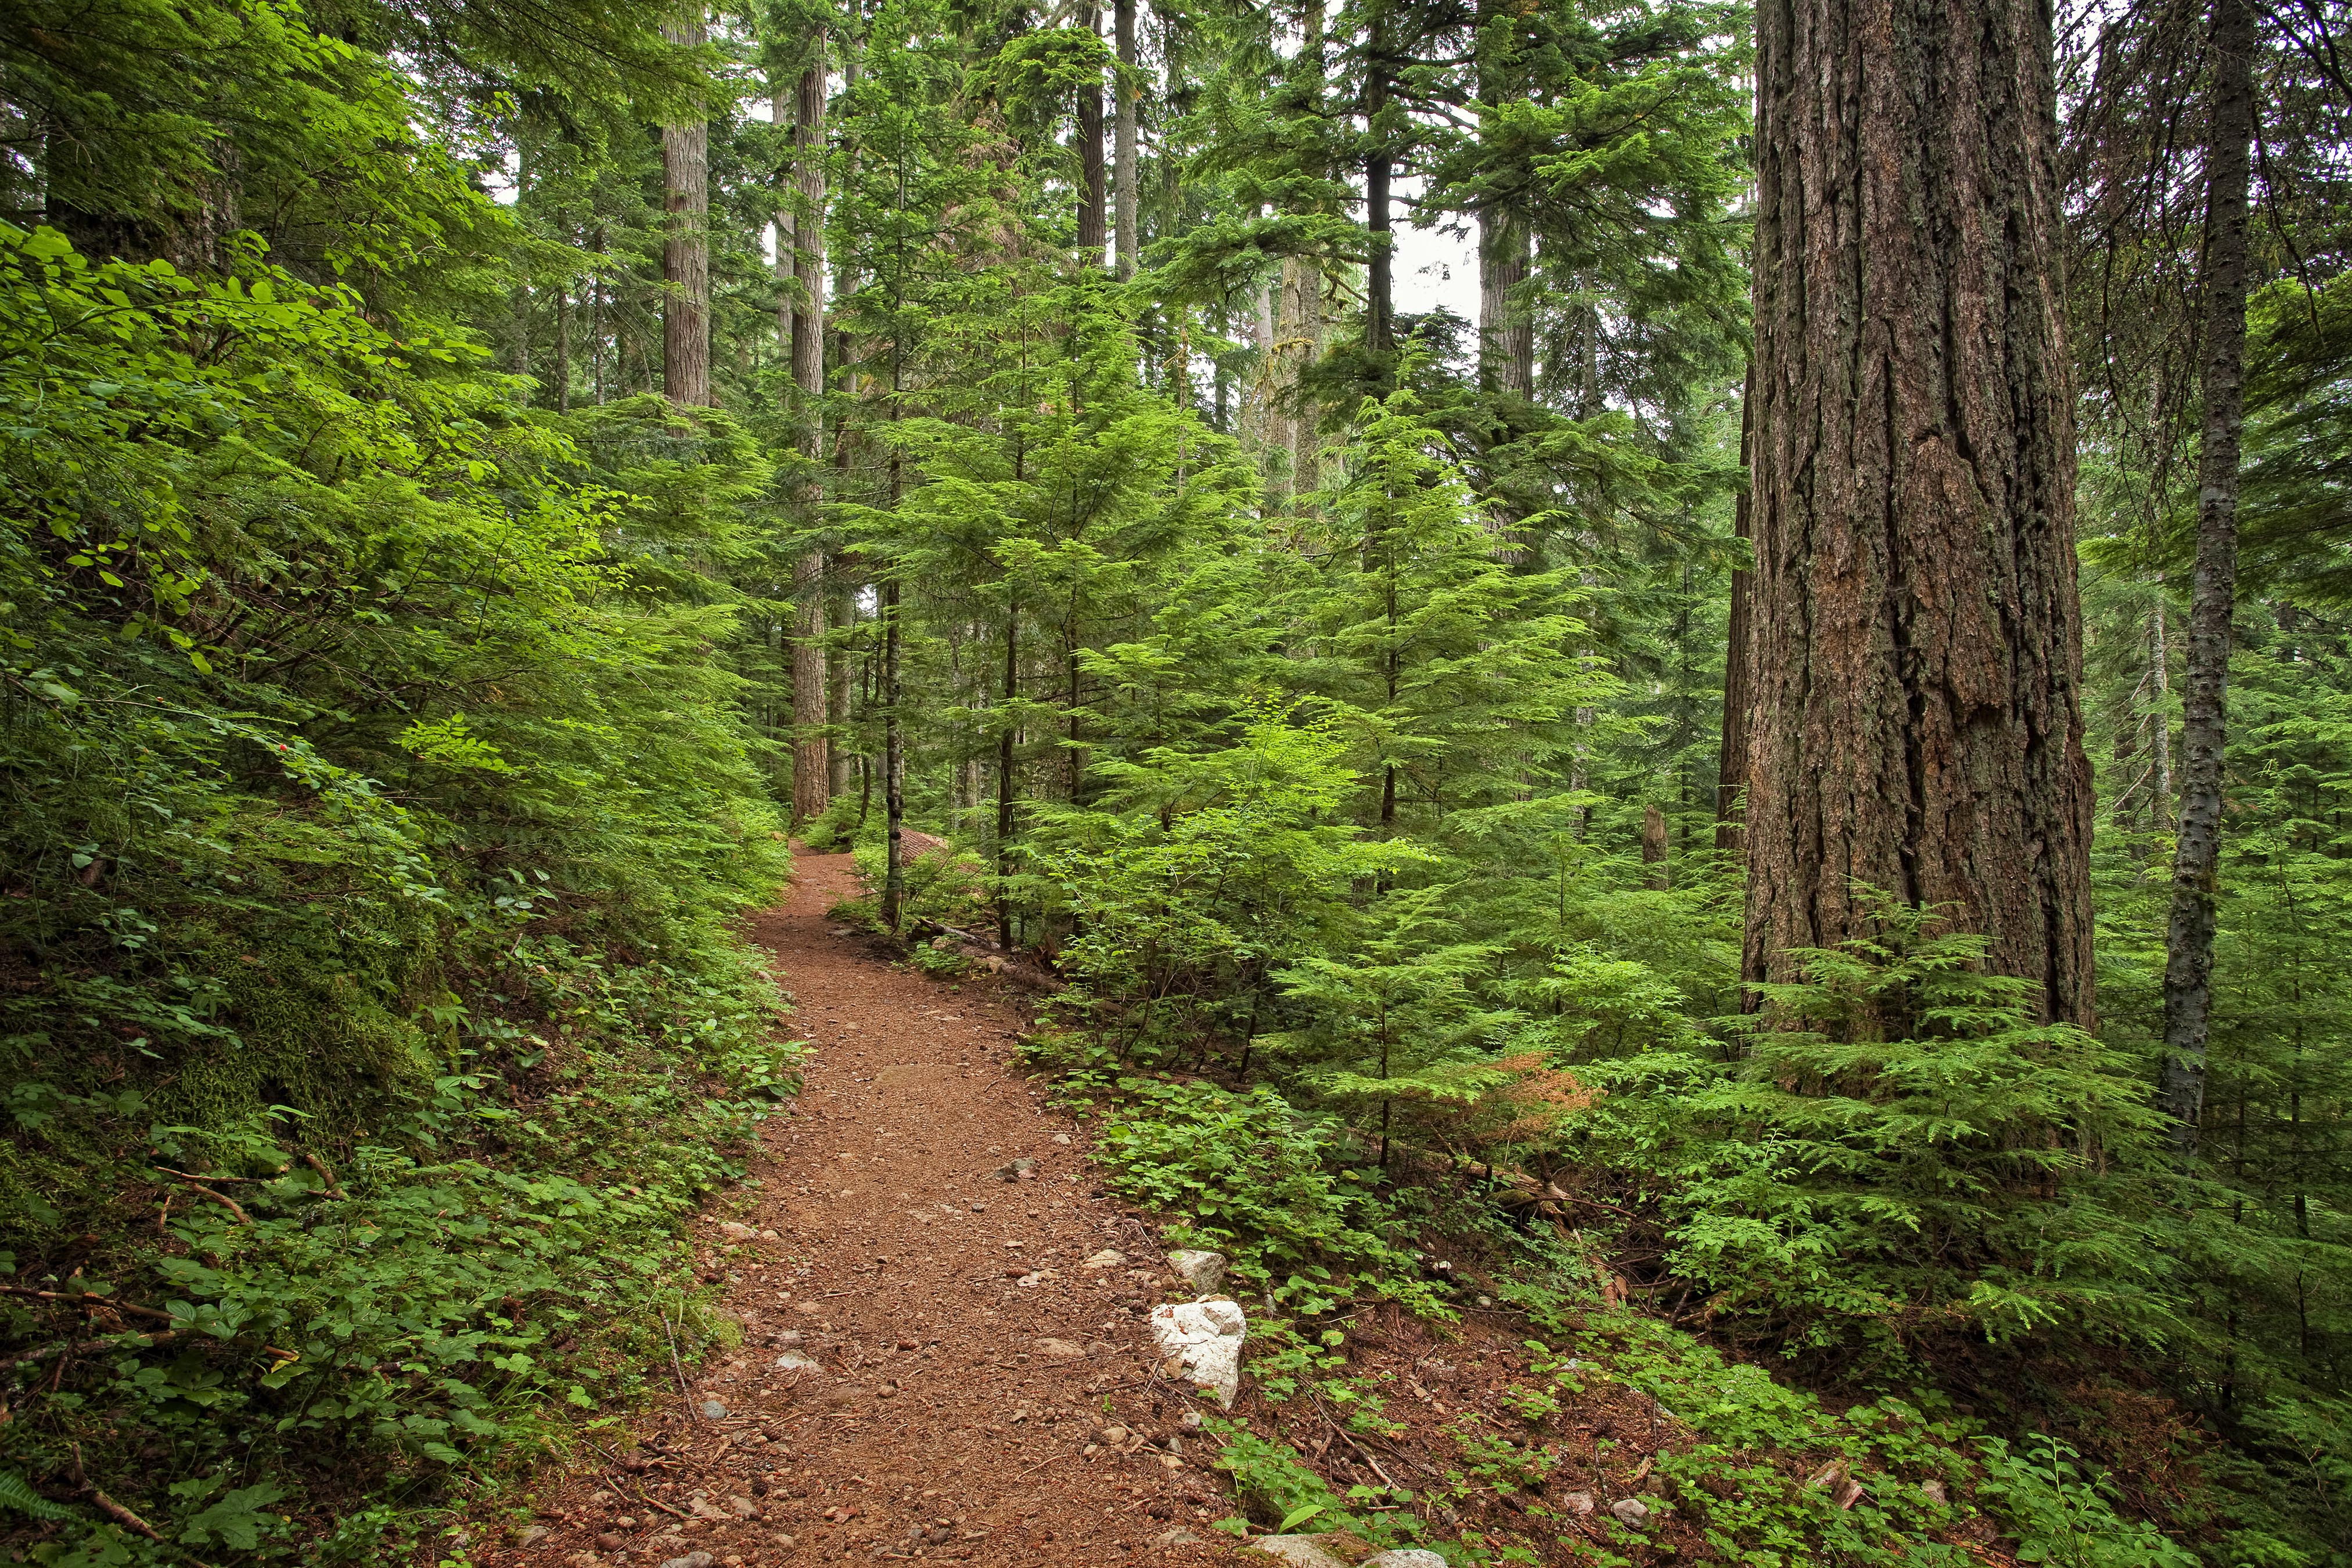 Asahel Curtis Nature Trail-8.7.2010-Aaron Bates..jpg